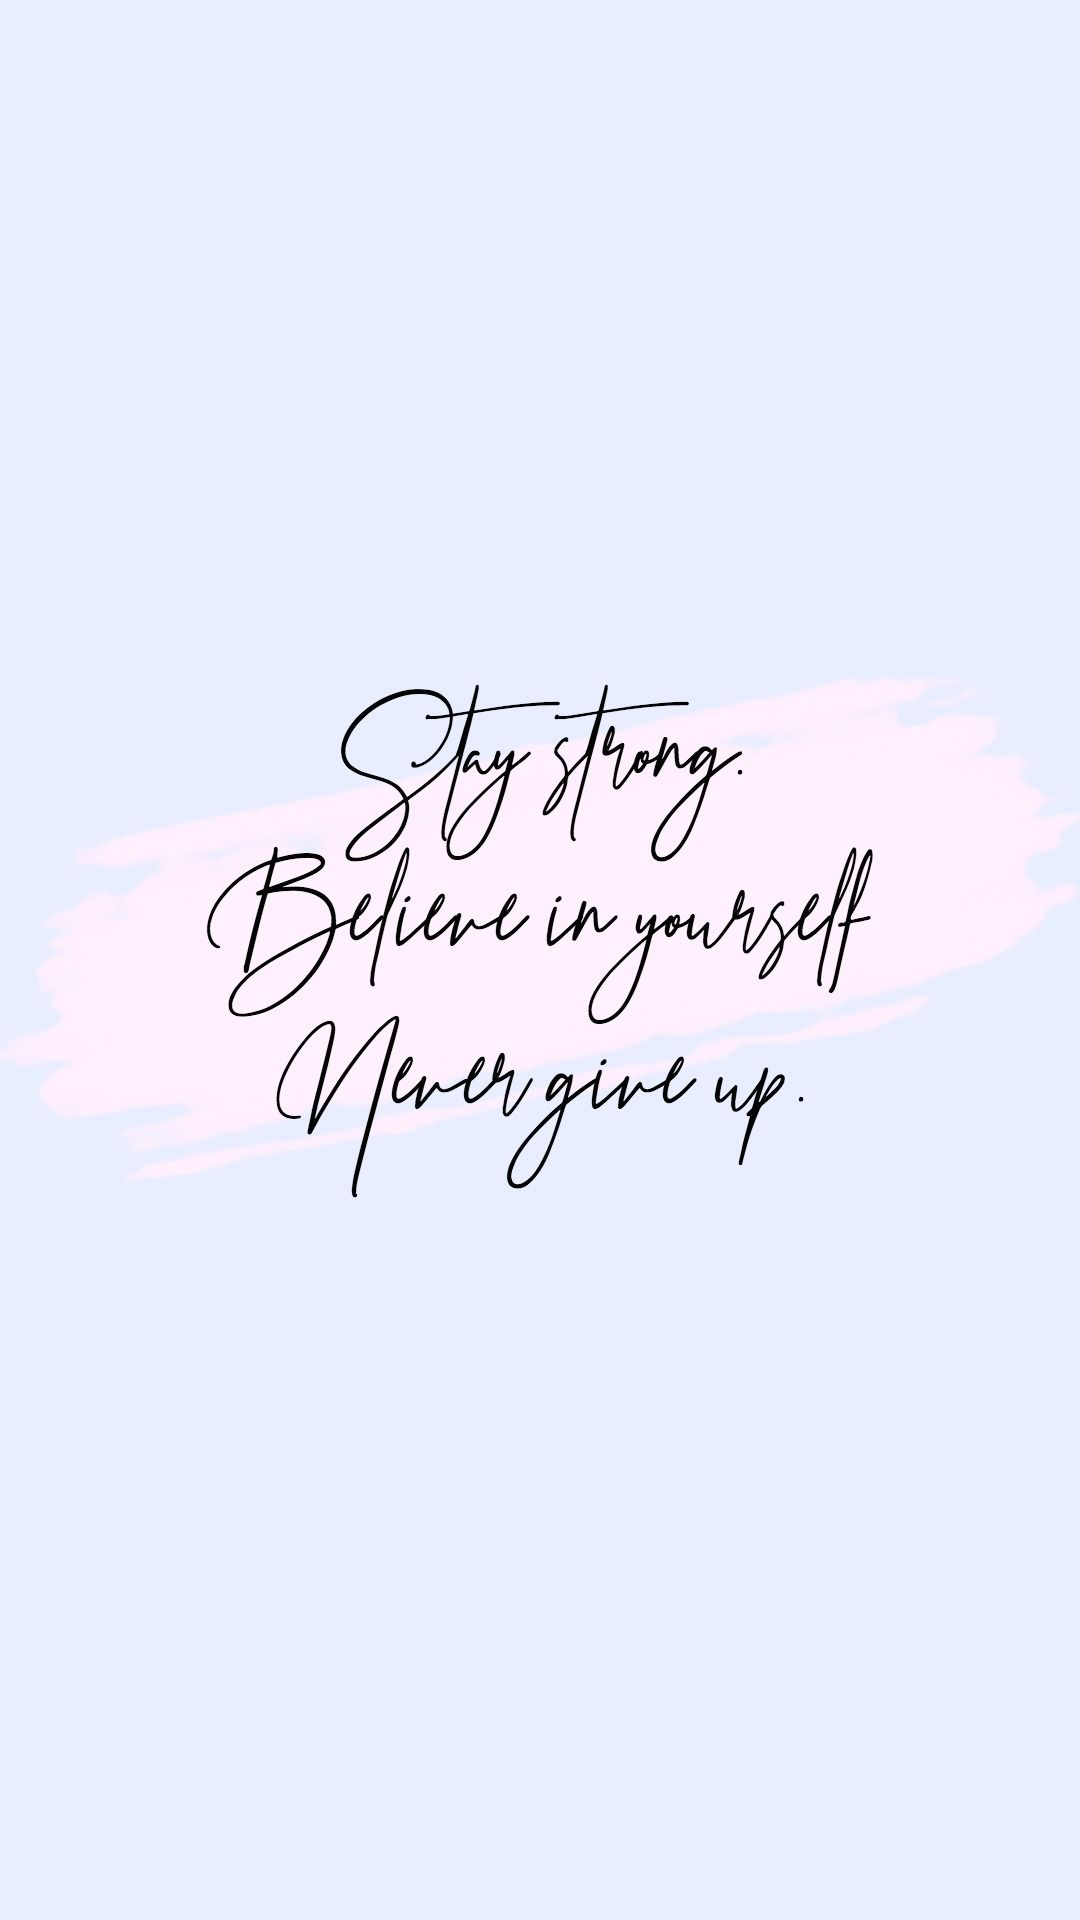 Self Motivation Positive Quotes Wallpaper Iphone - HD Wallpaper